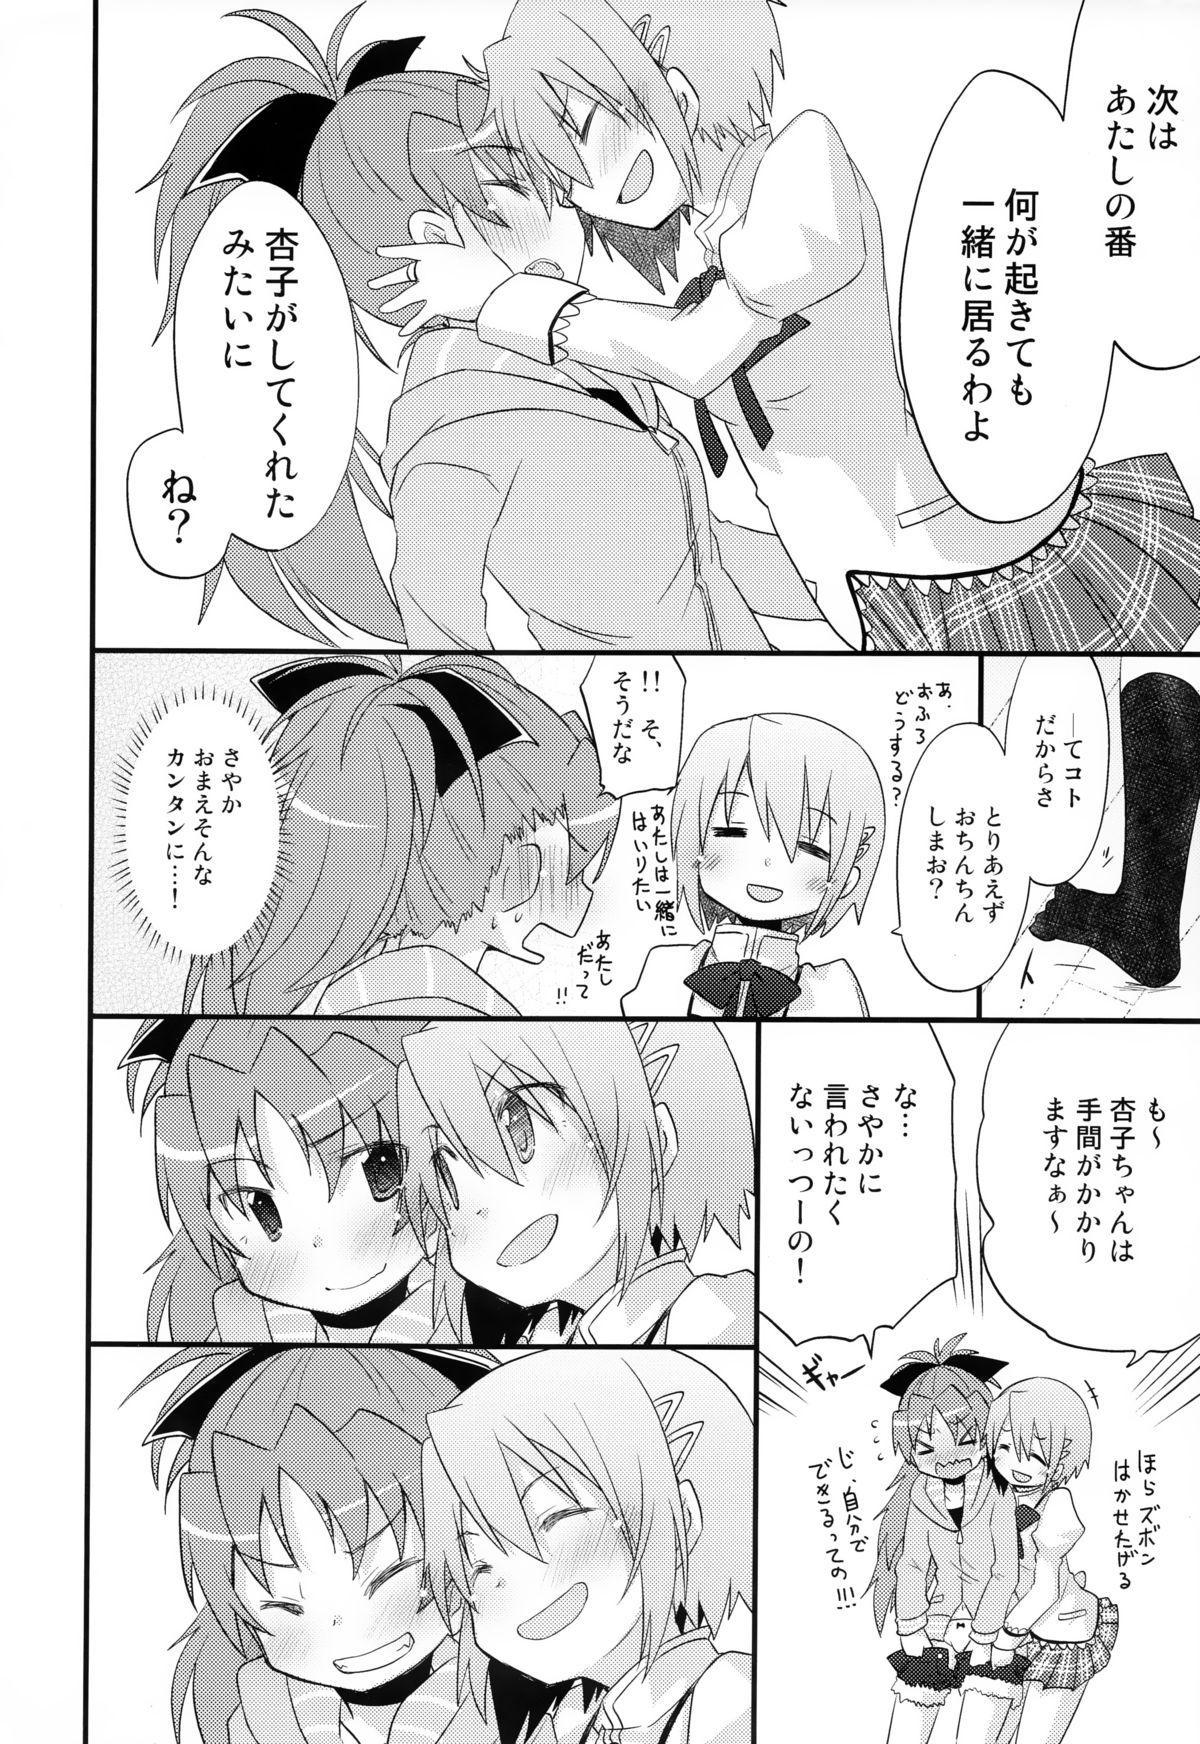 Futari no Hatsukousen 14